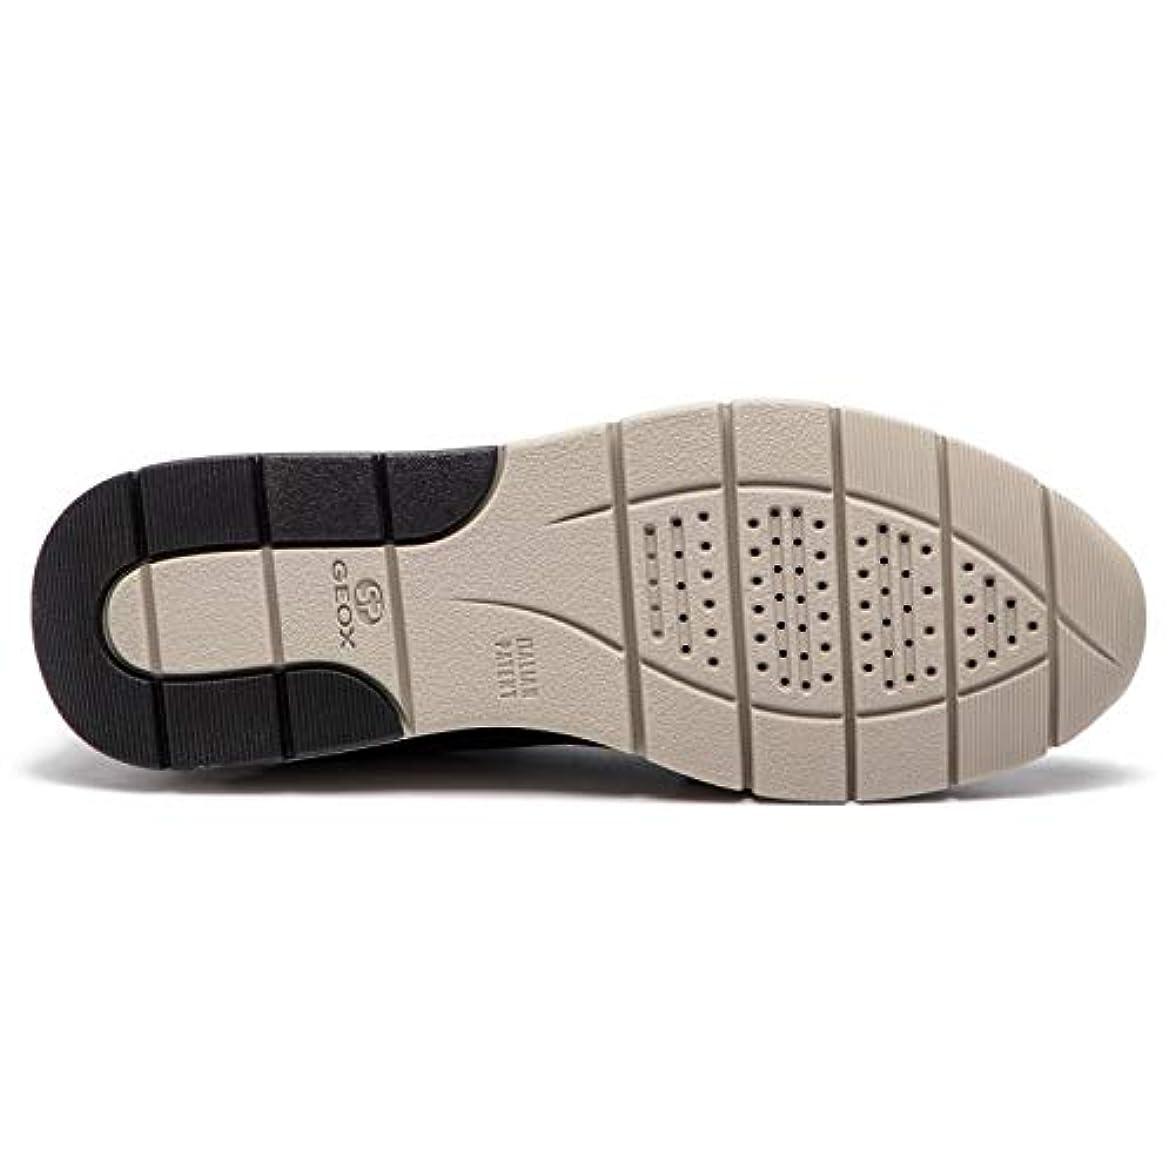 Geox Scarpe Da Donna Sneakers D Callyn In Tessuto Nero D849gd-0ewhh-c9999